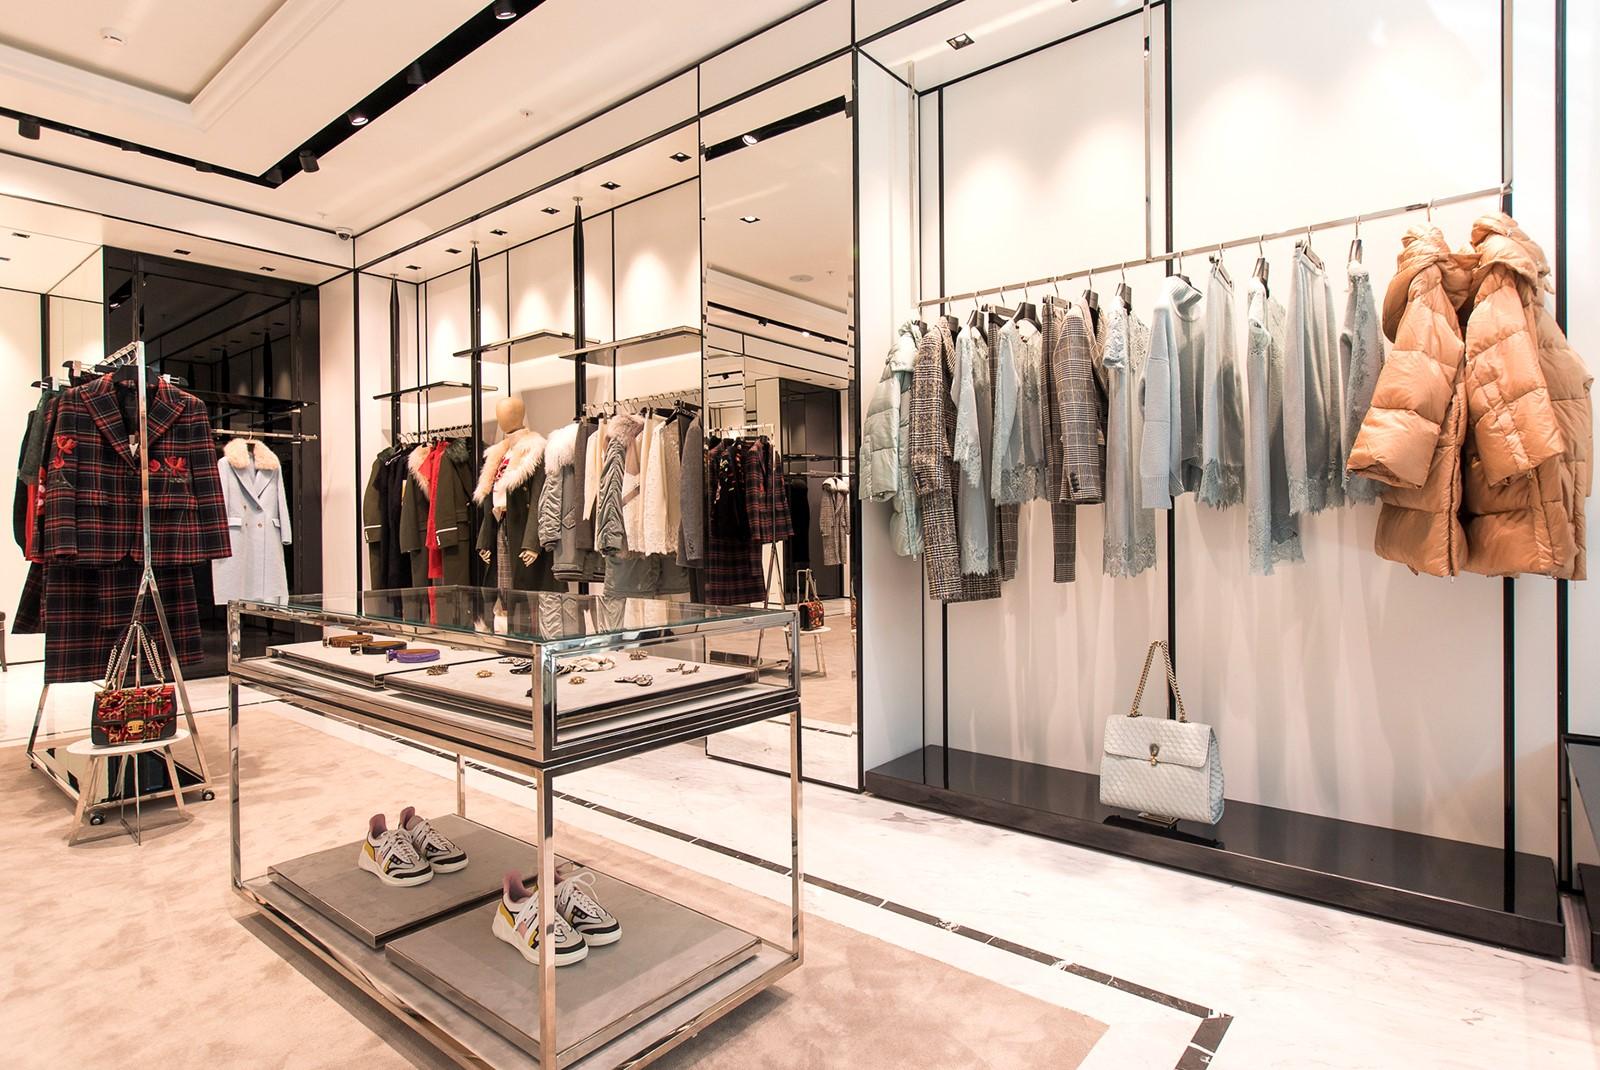 f344310e03b2e Opening of the new Ermanno Scervino store in Crocus City Mall